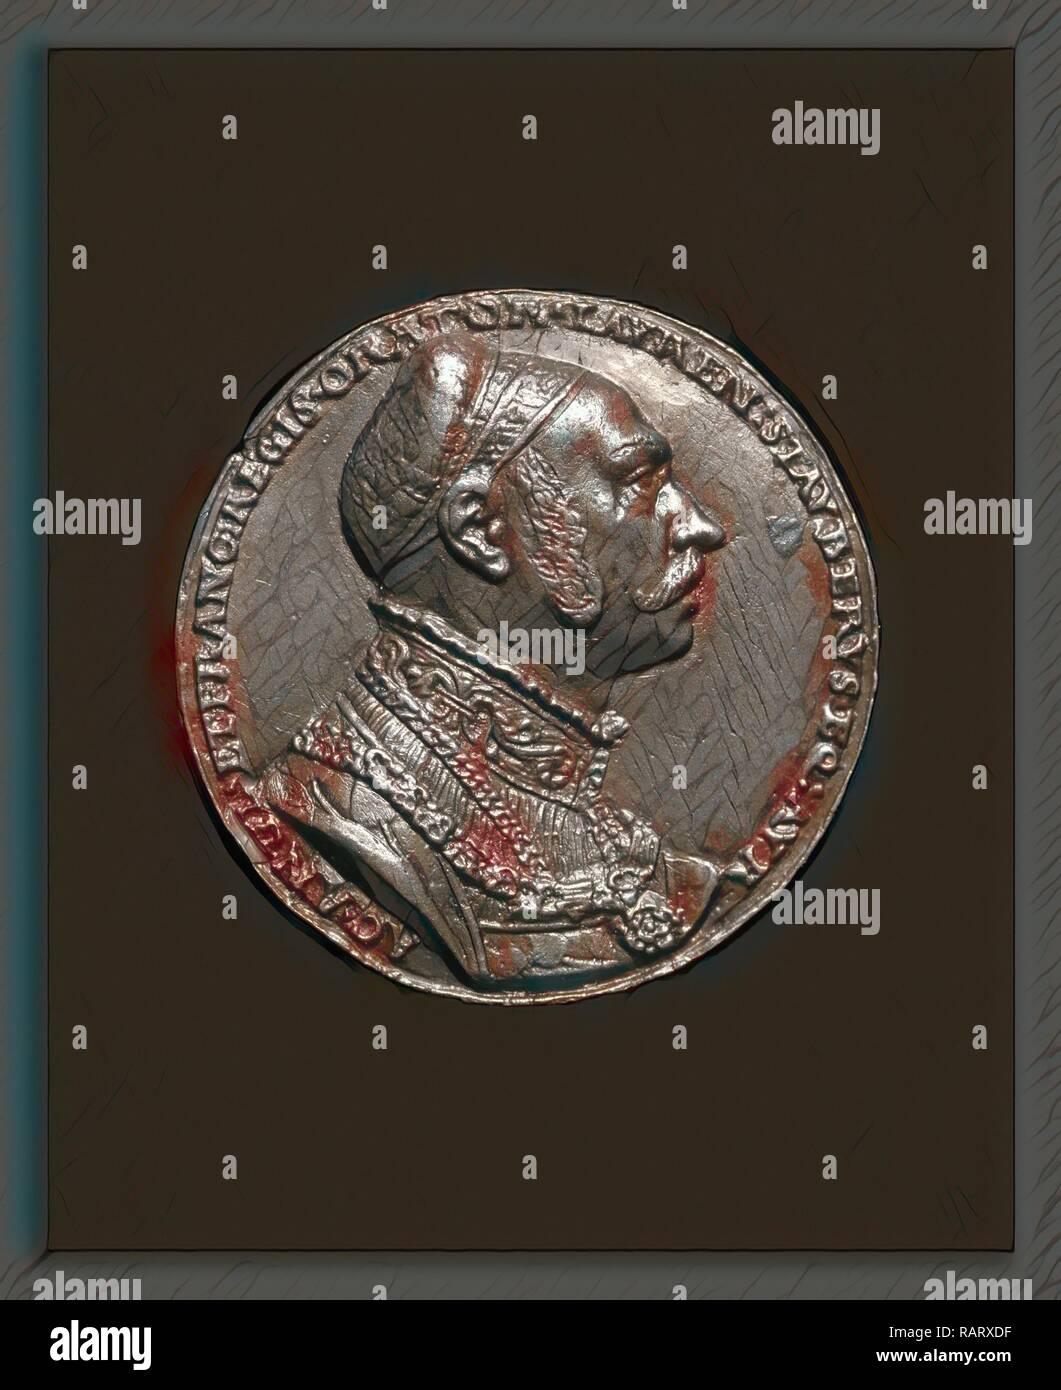 Matthes Gebel, Lorenz Staiber, 1485-1486-1539, German Writer and Orator [obverse], German, c. 1500 - 1574, 1535, lead reimagined - Stock Image